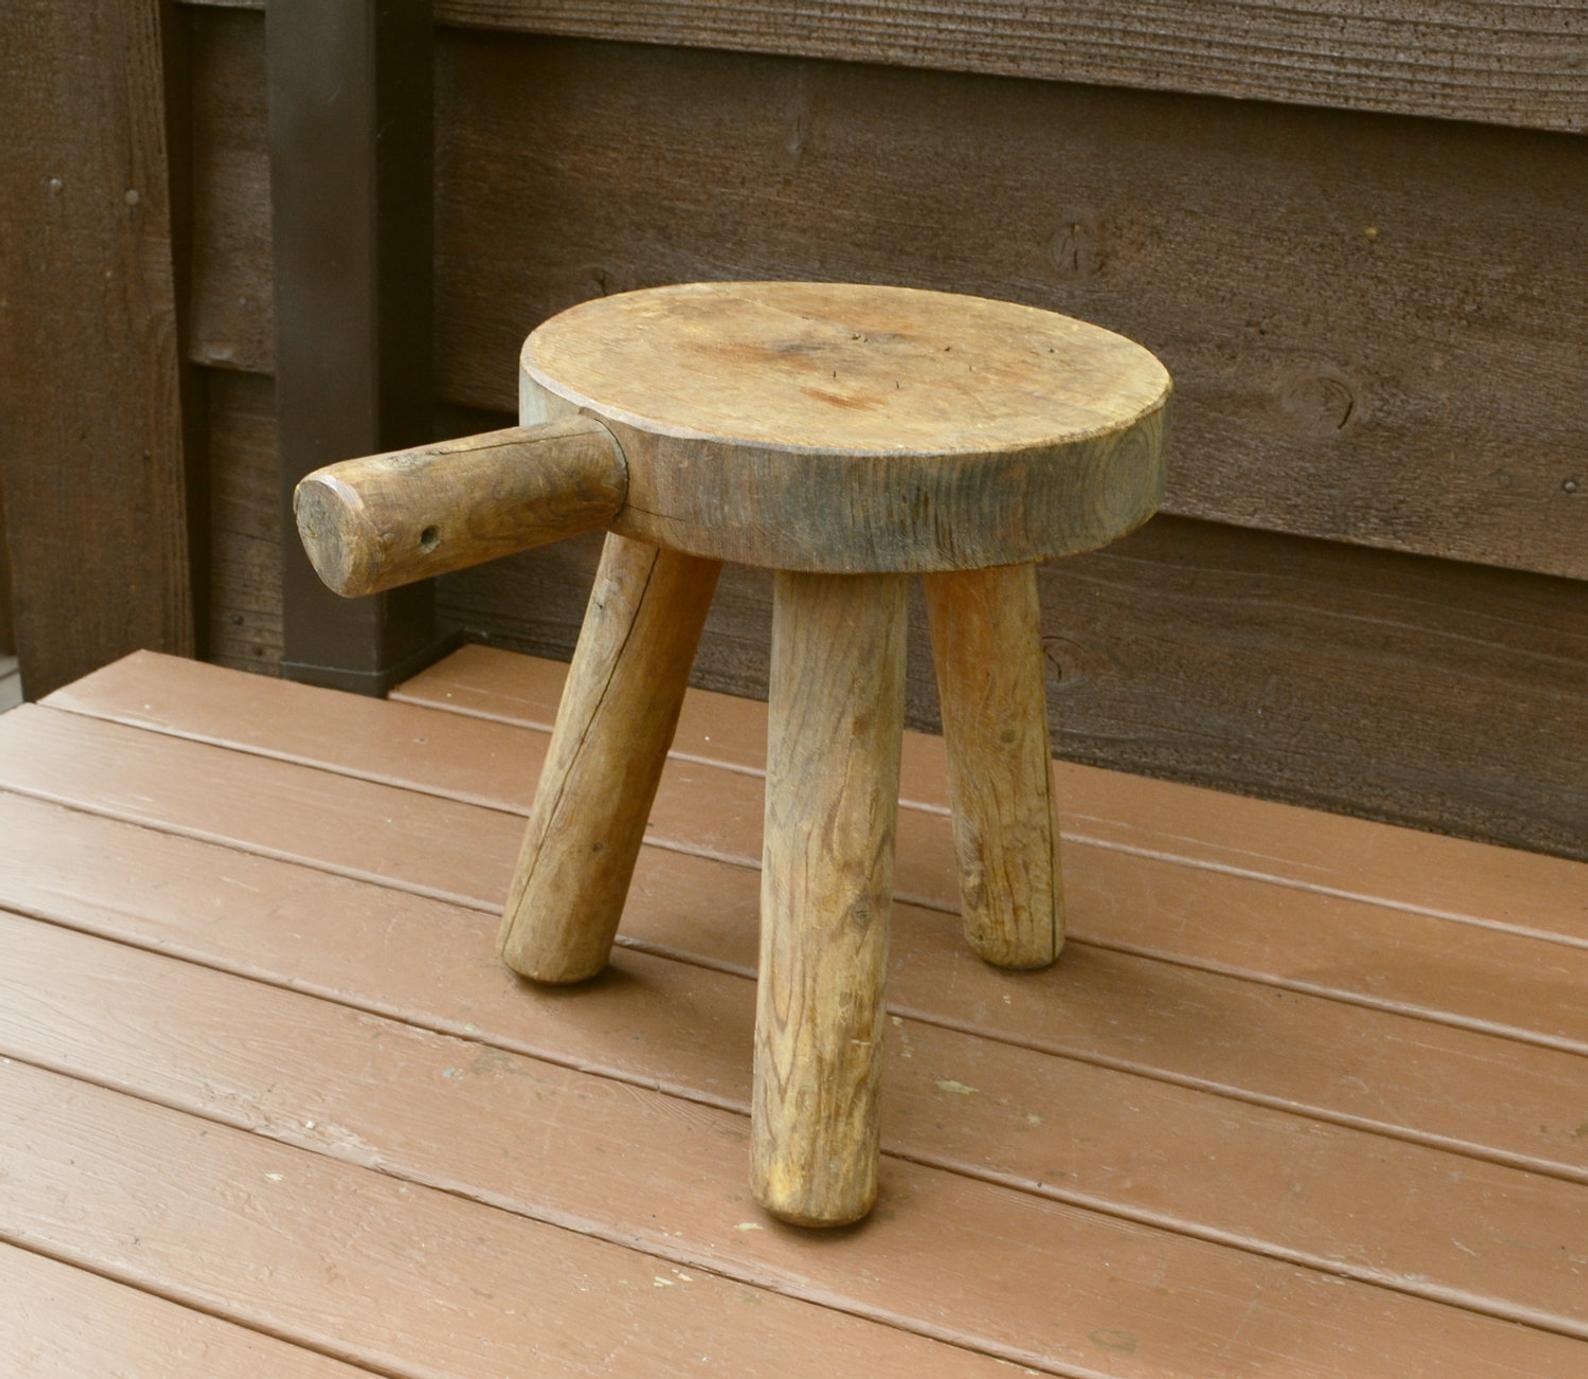 Walpole Woodworkers 3 Leg Wooden Stool Vintage Milking Stool